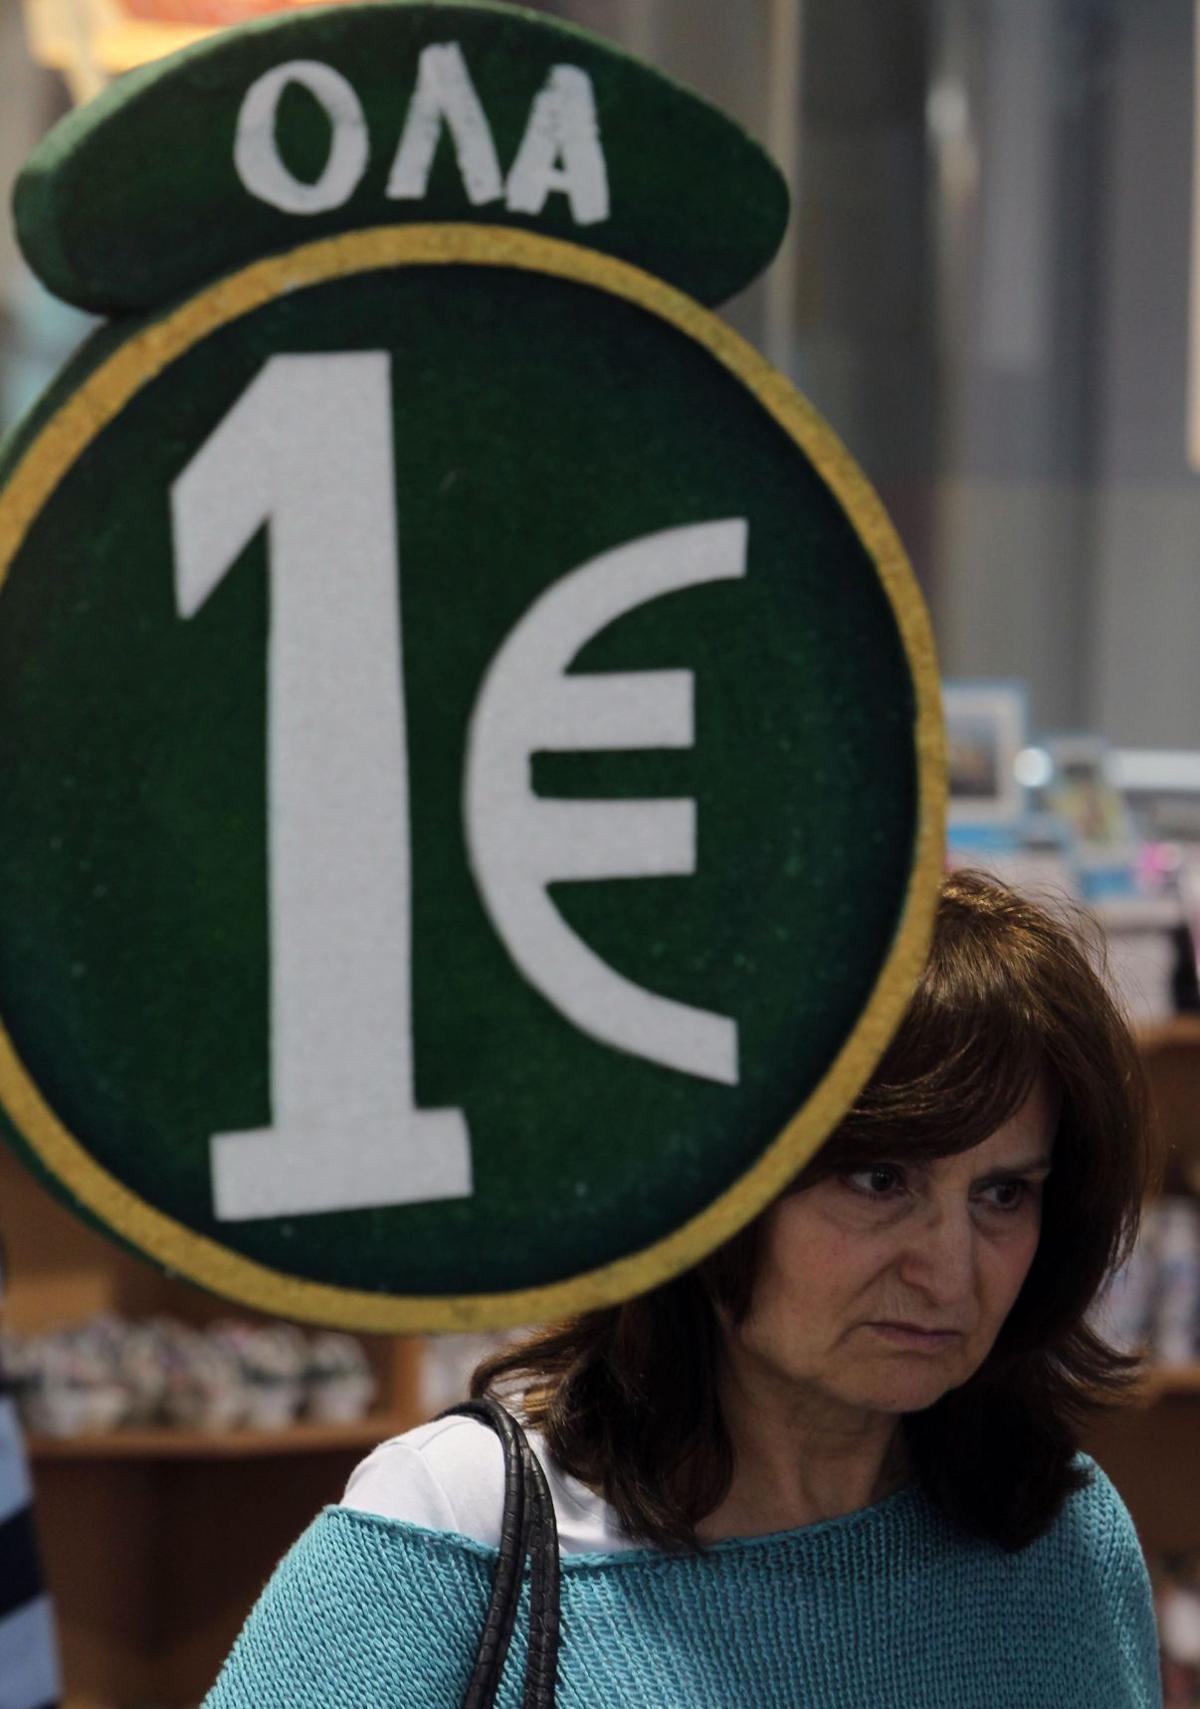 Greek stocks soar on pro-bailout party's poll gain